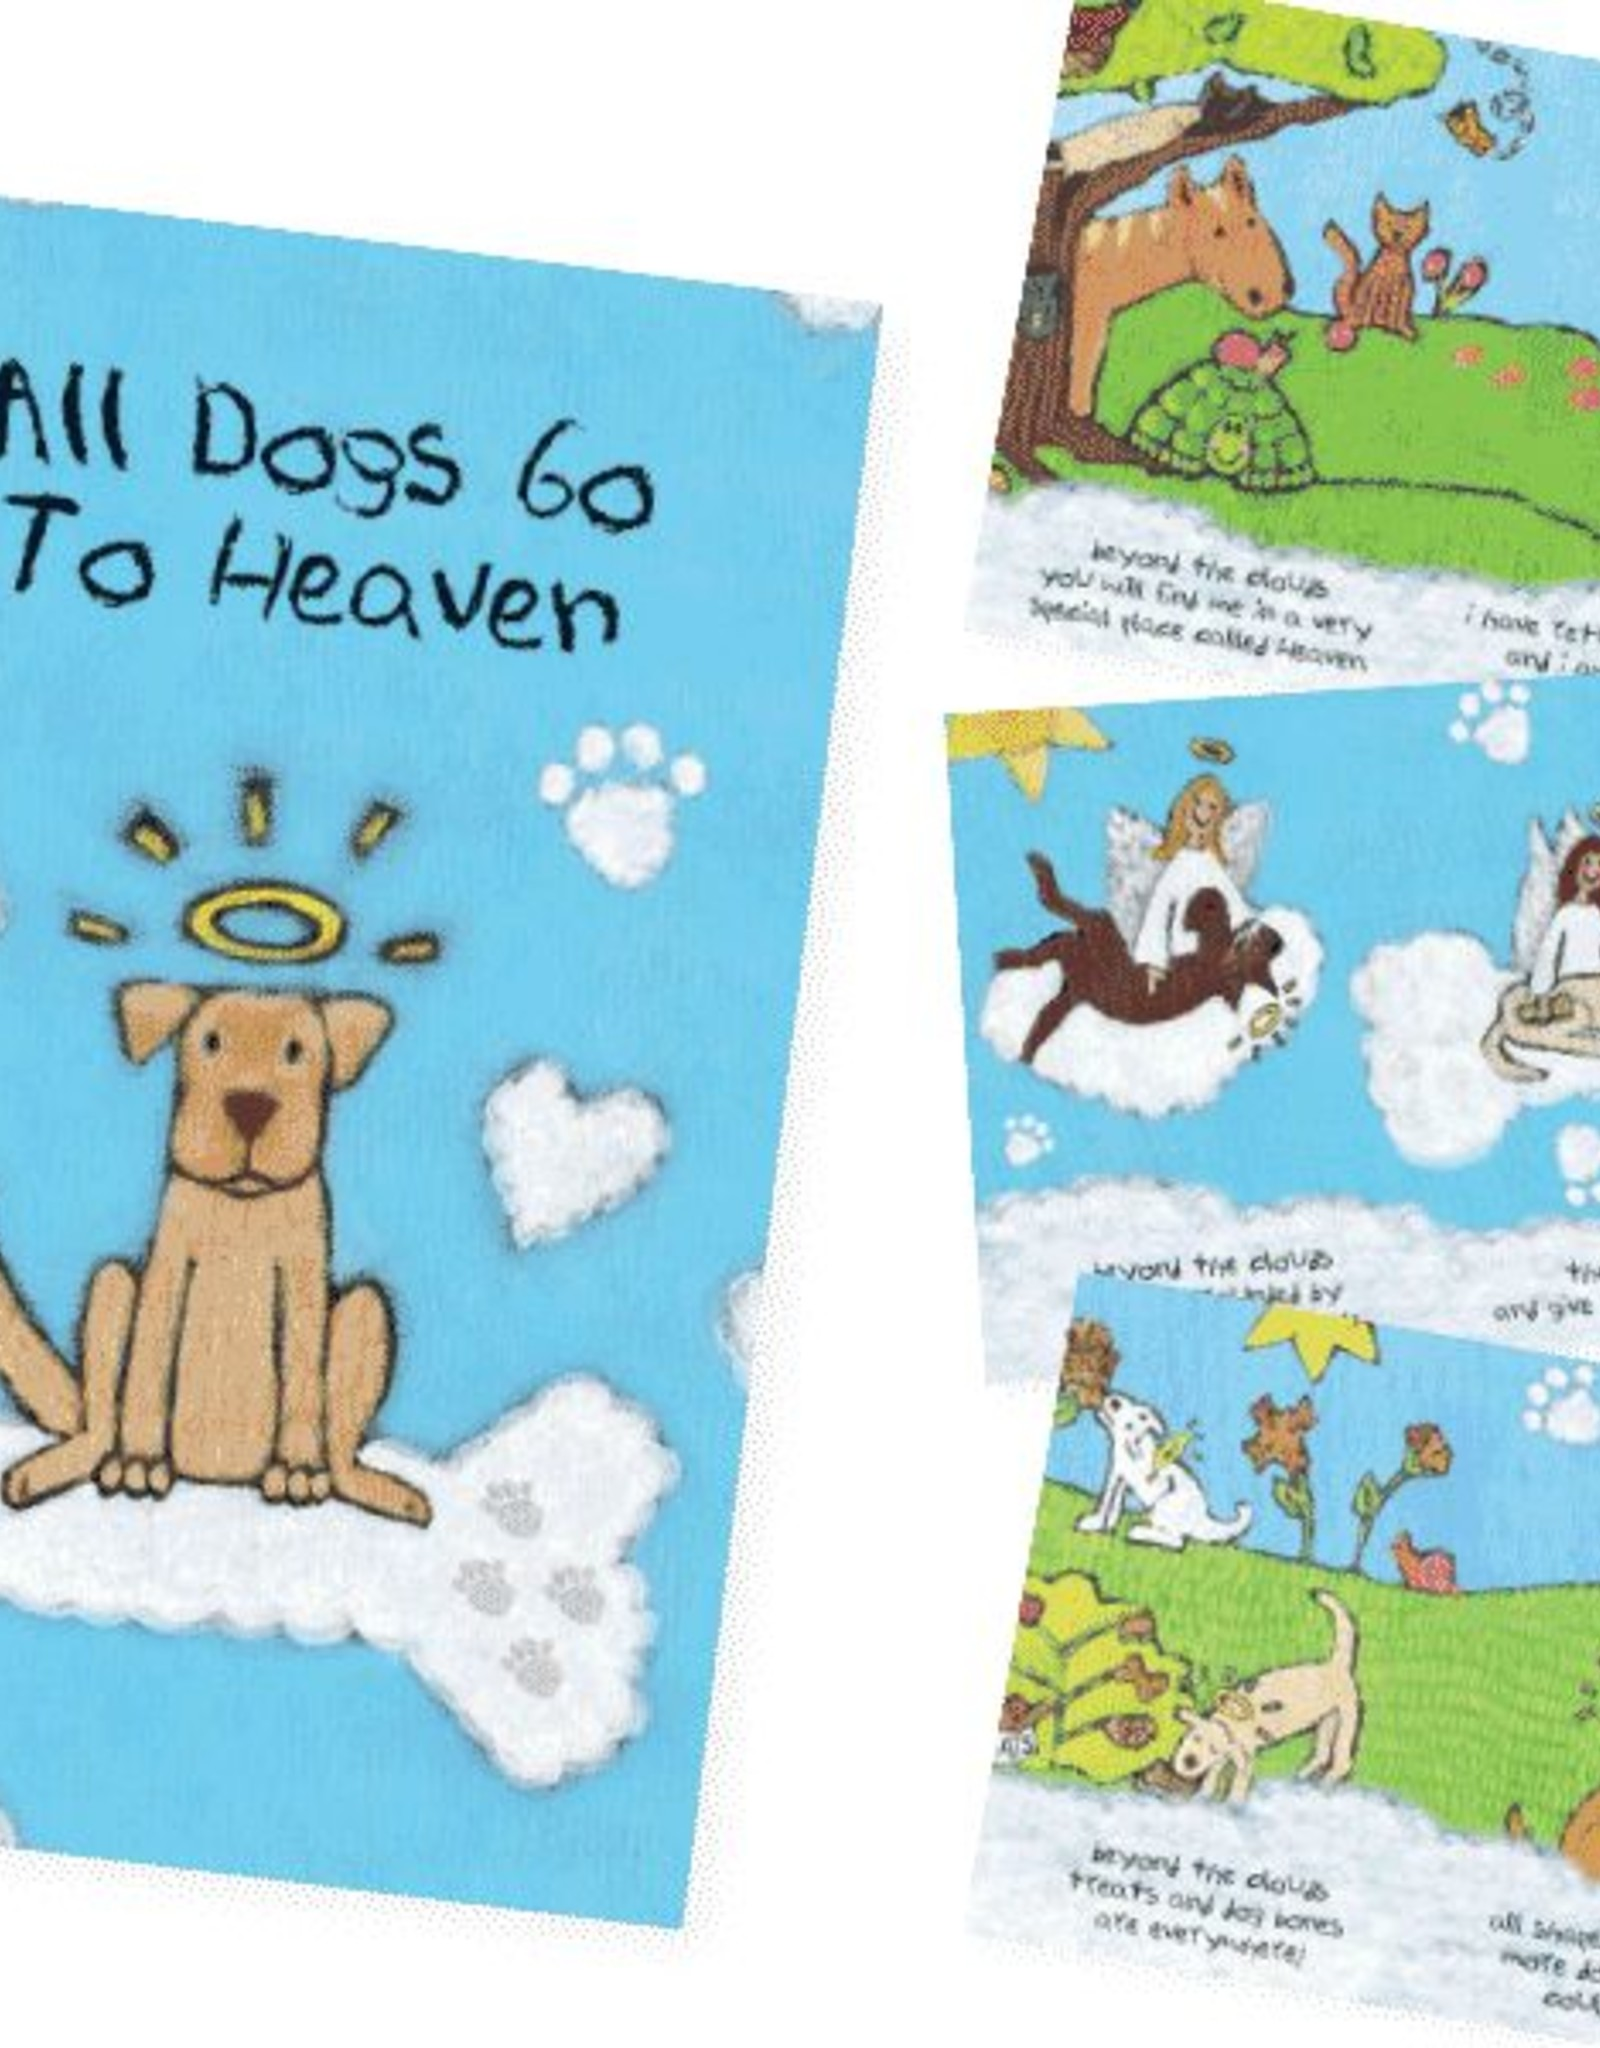 Dog Speak Dog Speak Card - Sympathy - All Dogs Go To Heaven Booklet